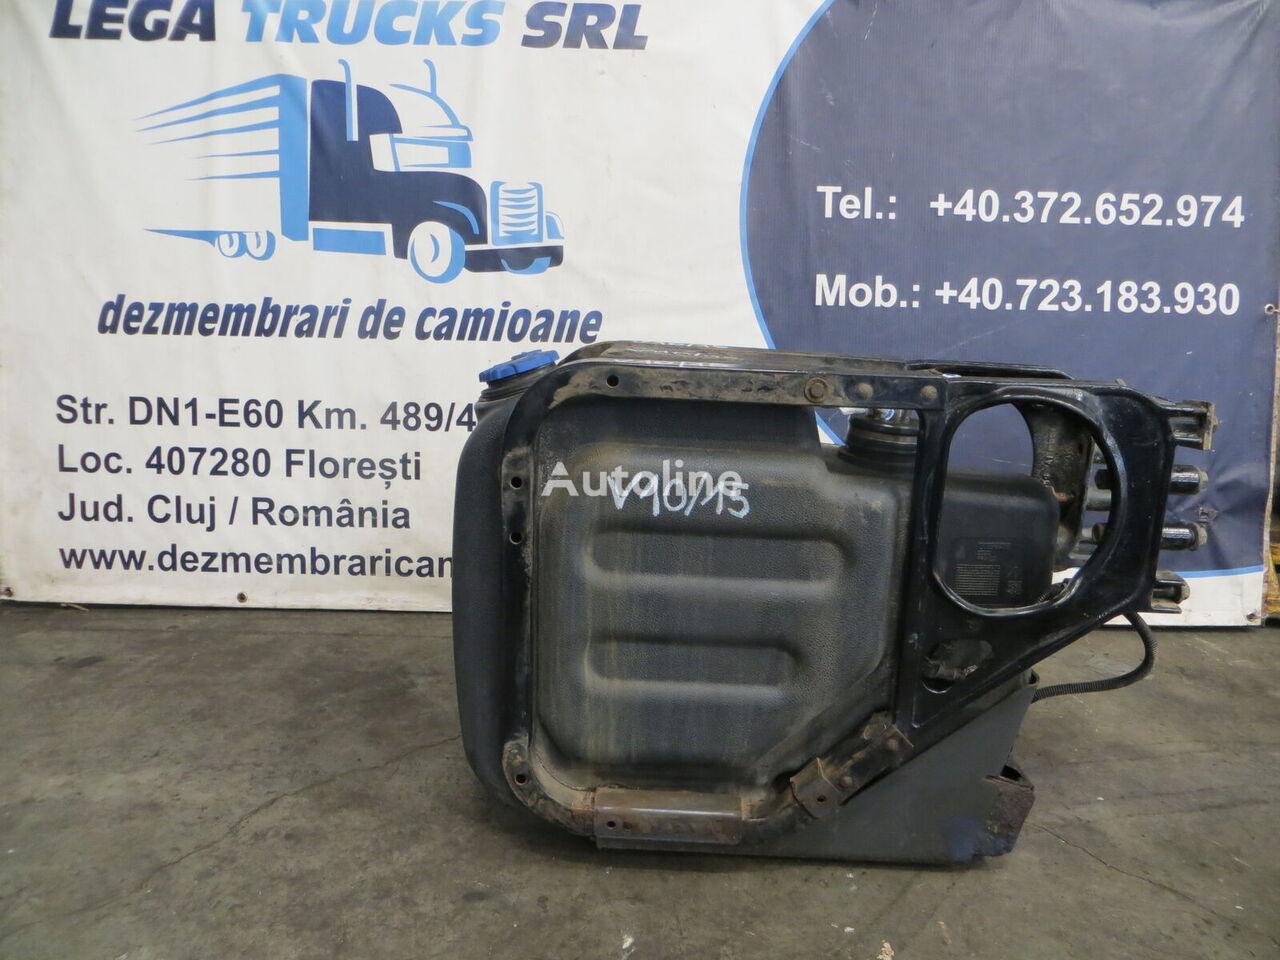 VOLVO Rezervor Ad Blue FH / V10/15 / 20856466 AdBlue tank for VOLVO FH tractor unit